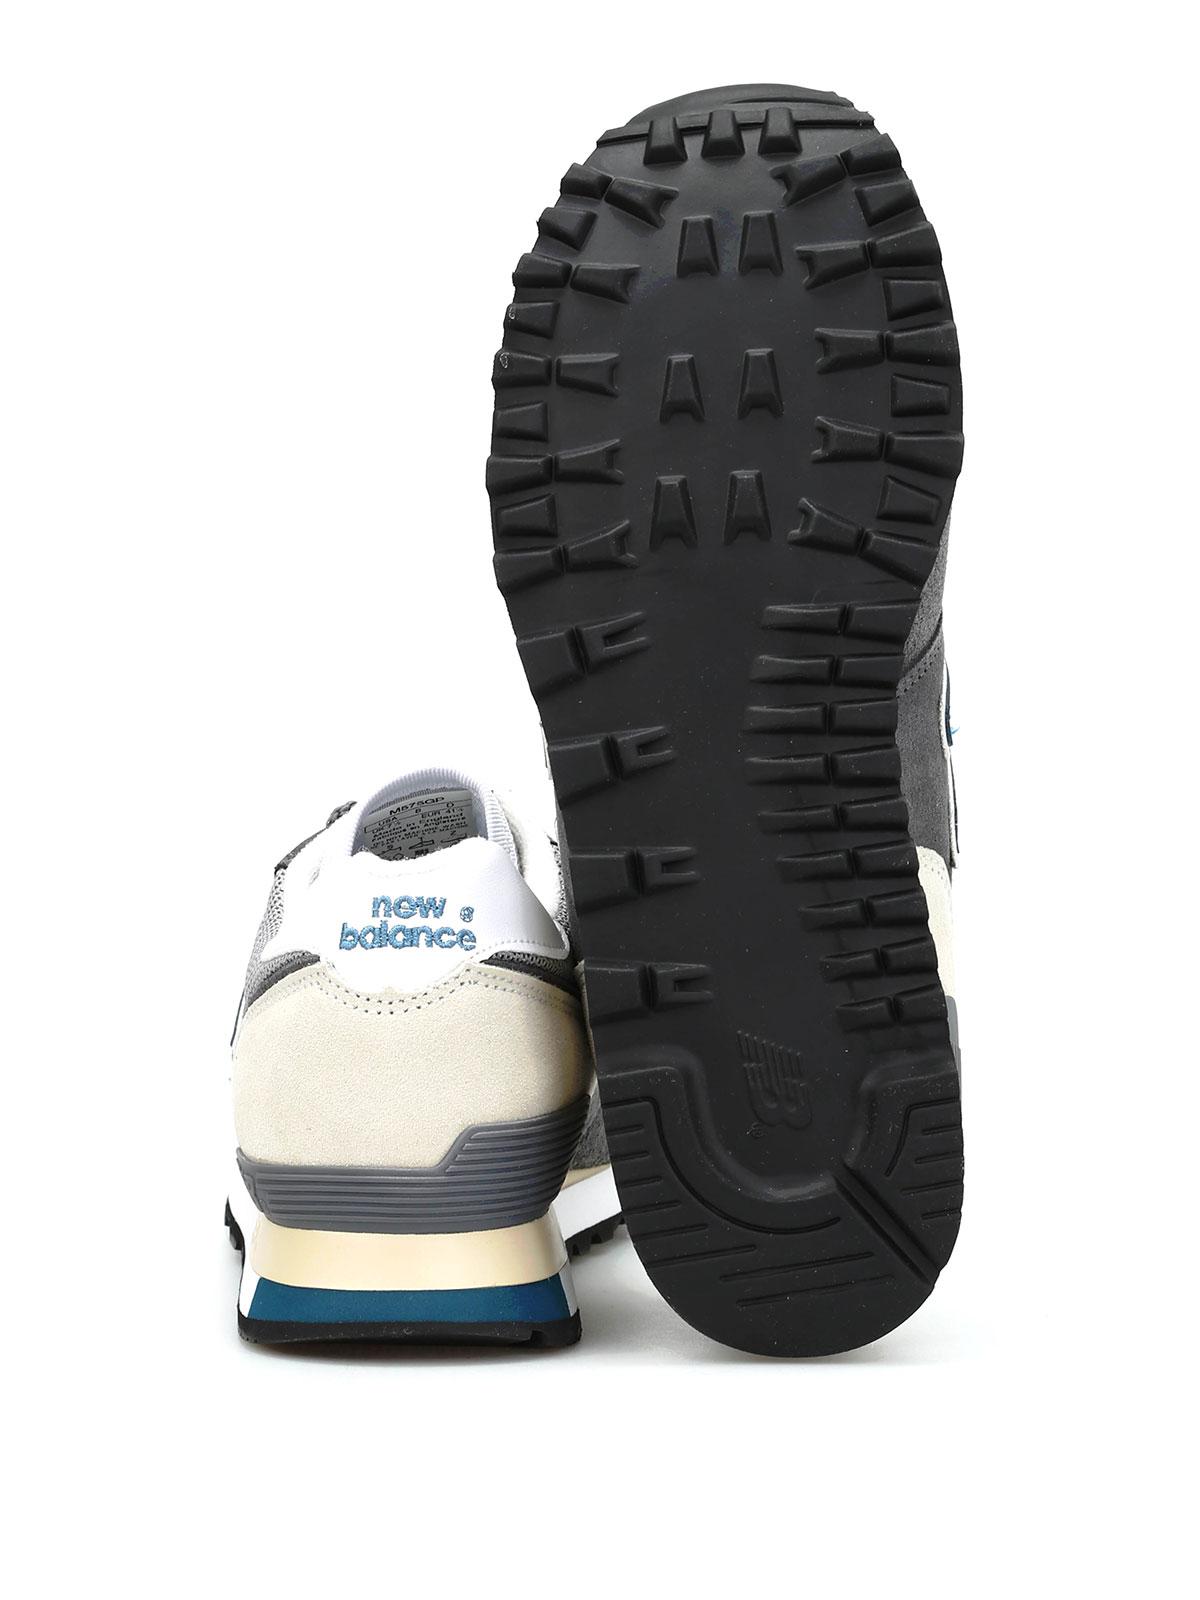 0f383c34103 New Balance - 575 Classics running sneakers - trainers - NB ...